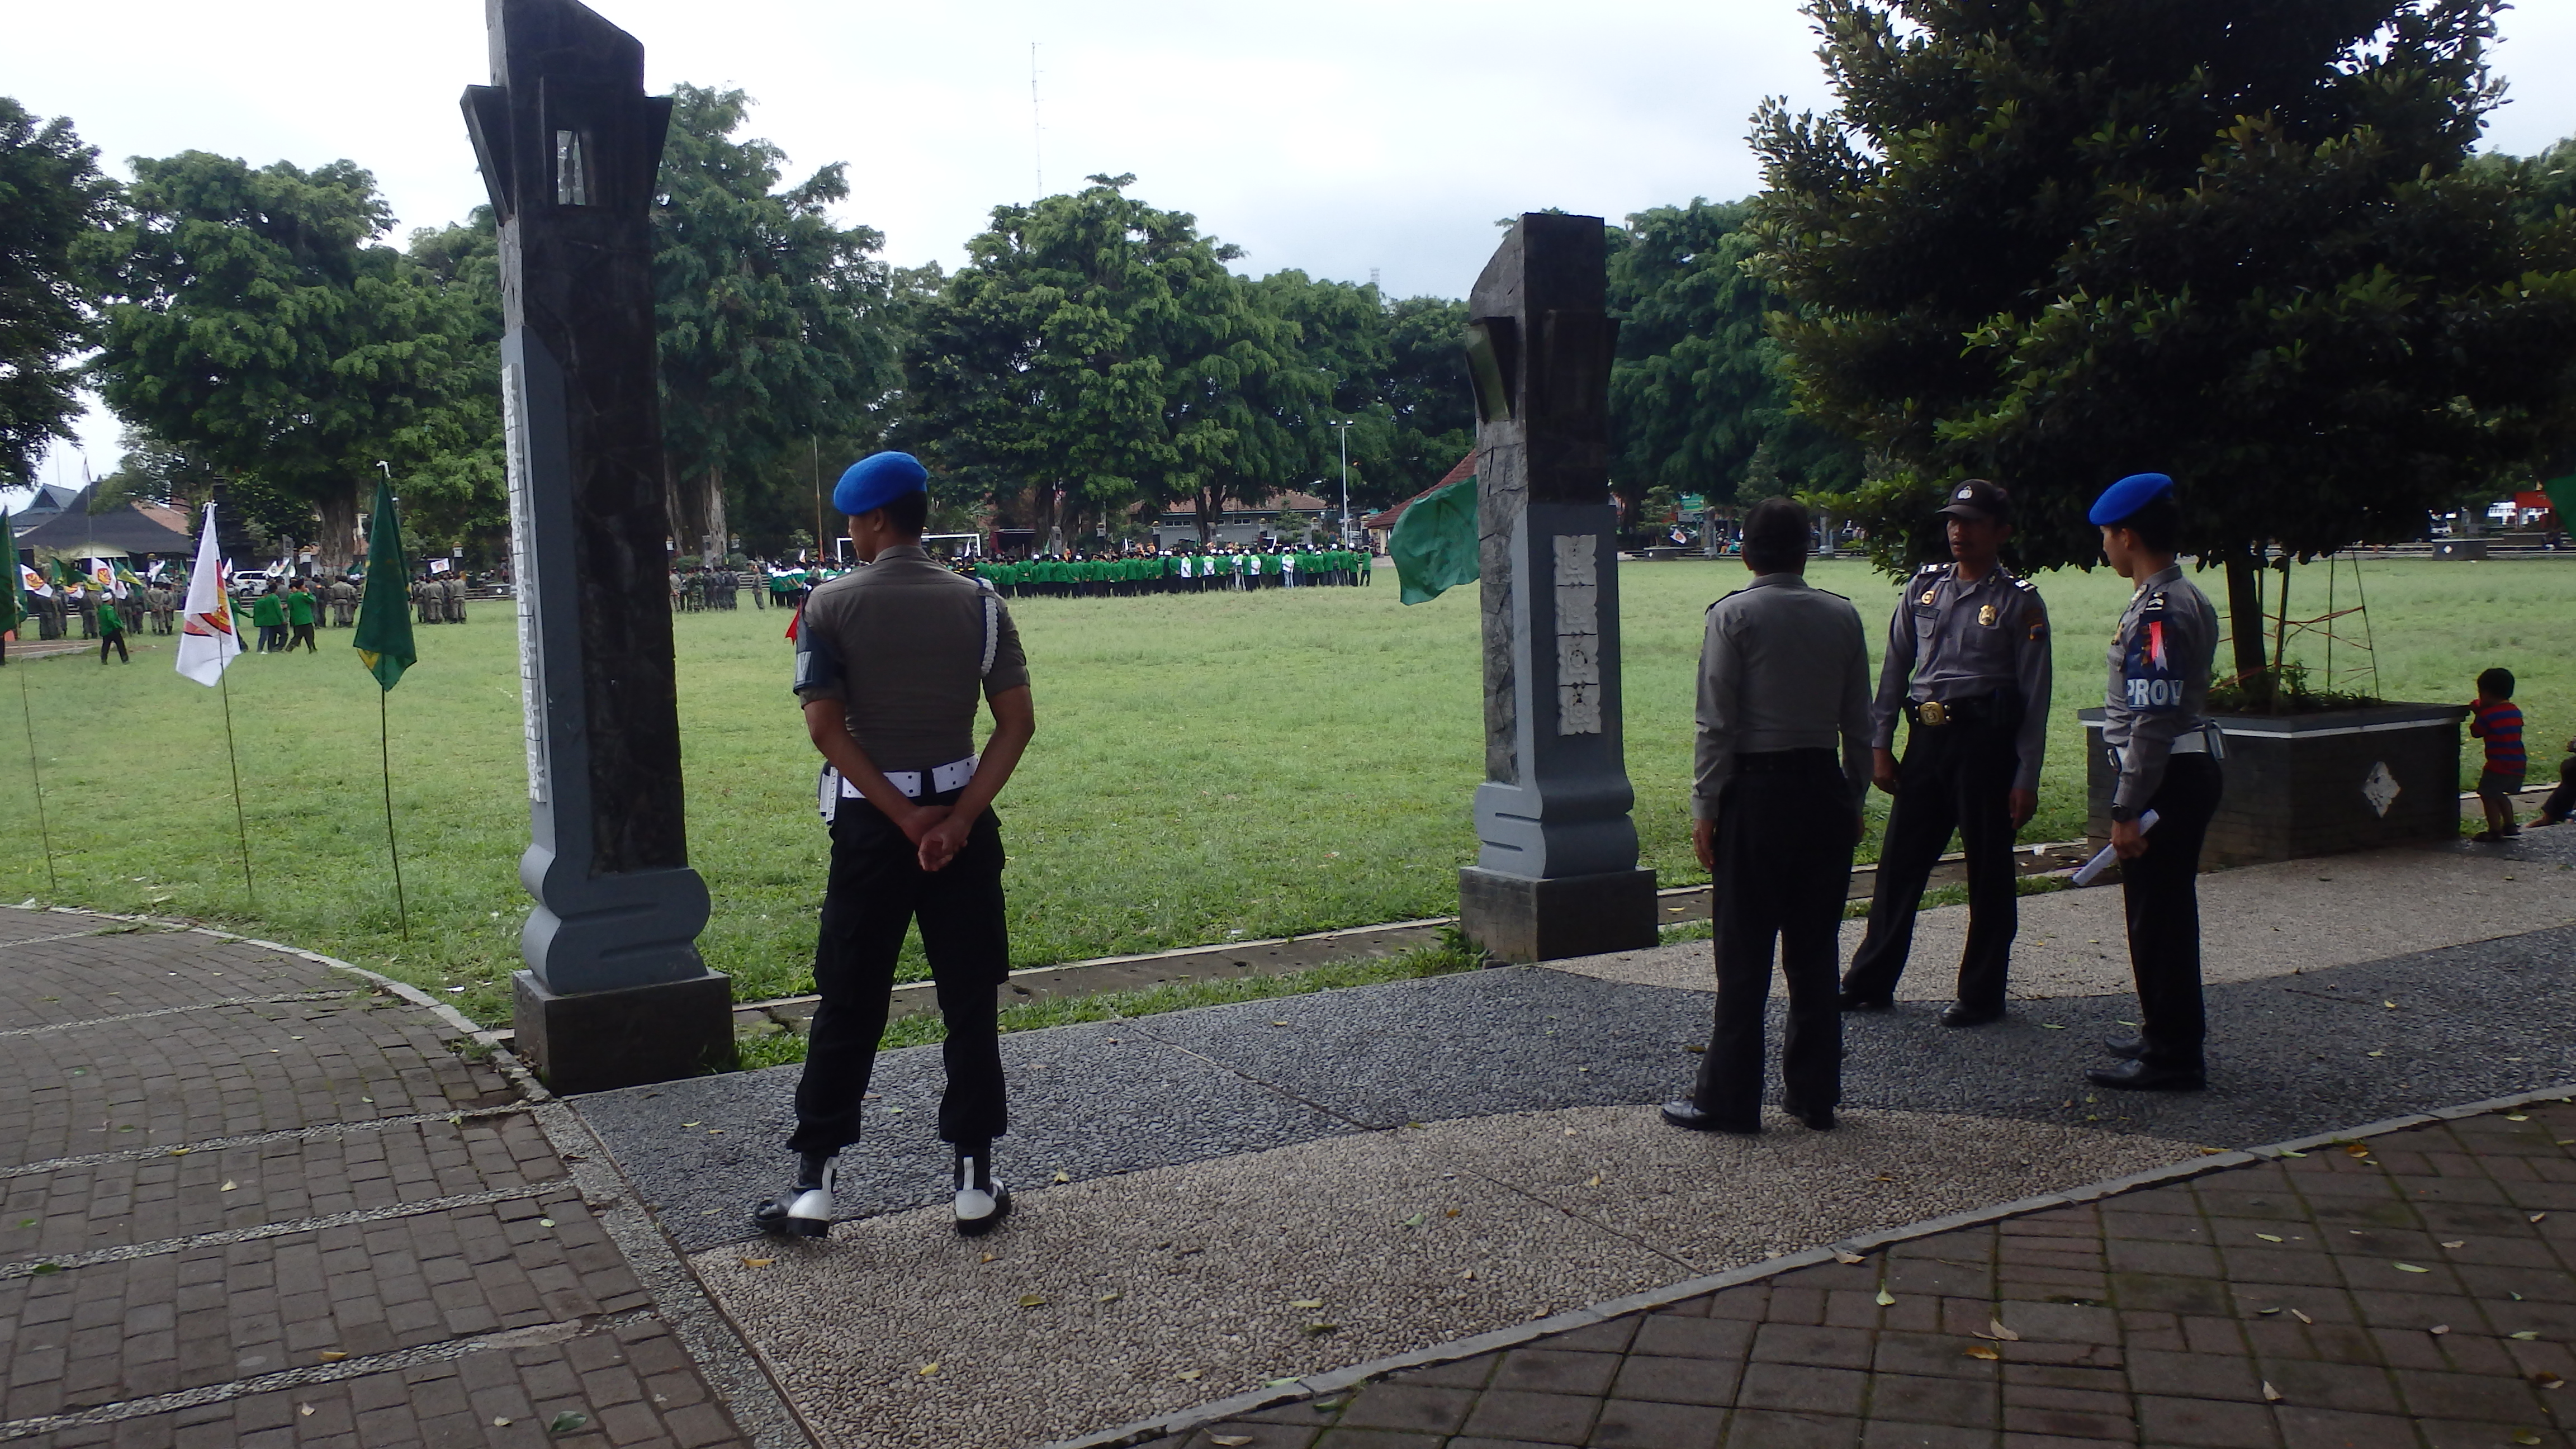 Polisi Amankan Apel Kebangsaan Banser Wonosobo Tribrata News Resor Alun